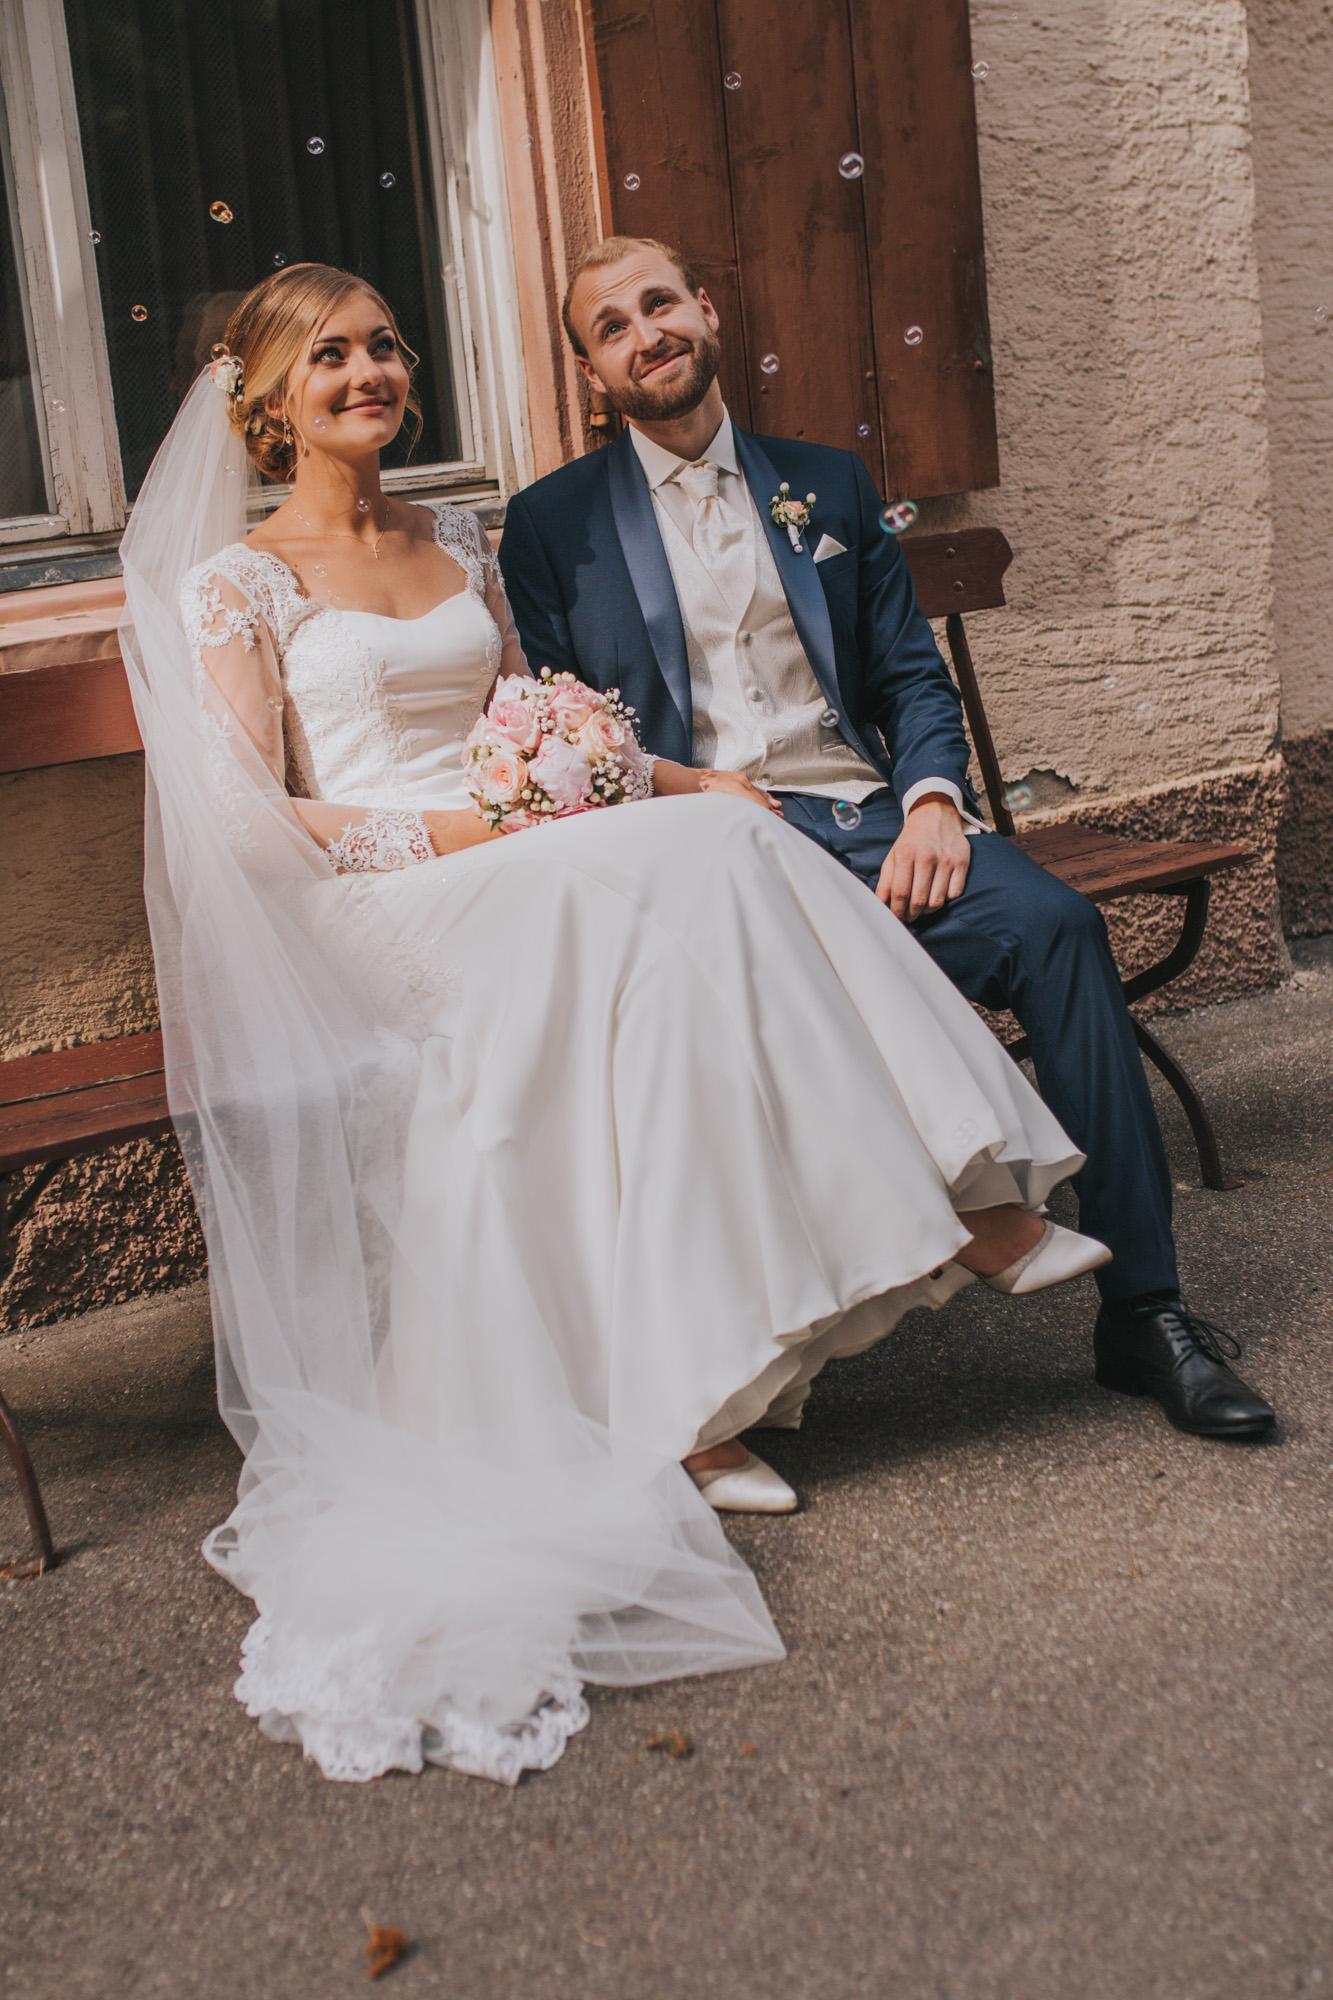 Hochzeit - Memory factory - 20180616-0053.jpg